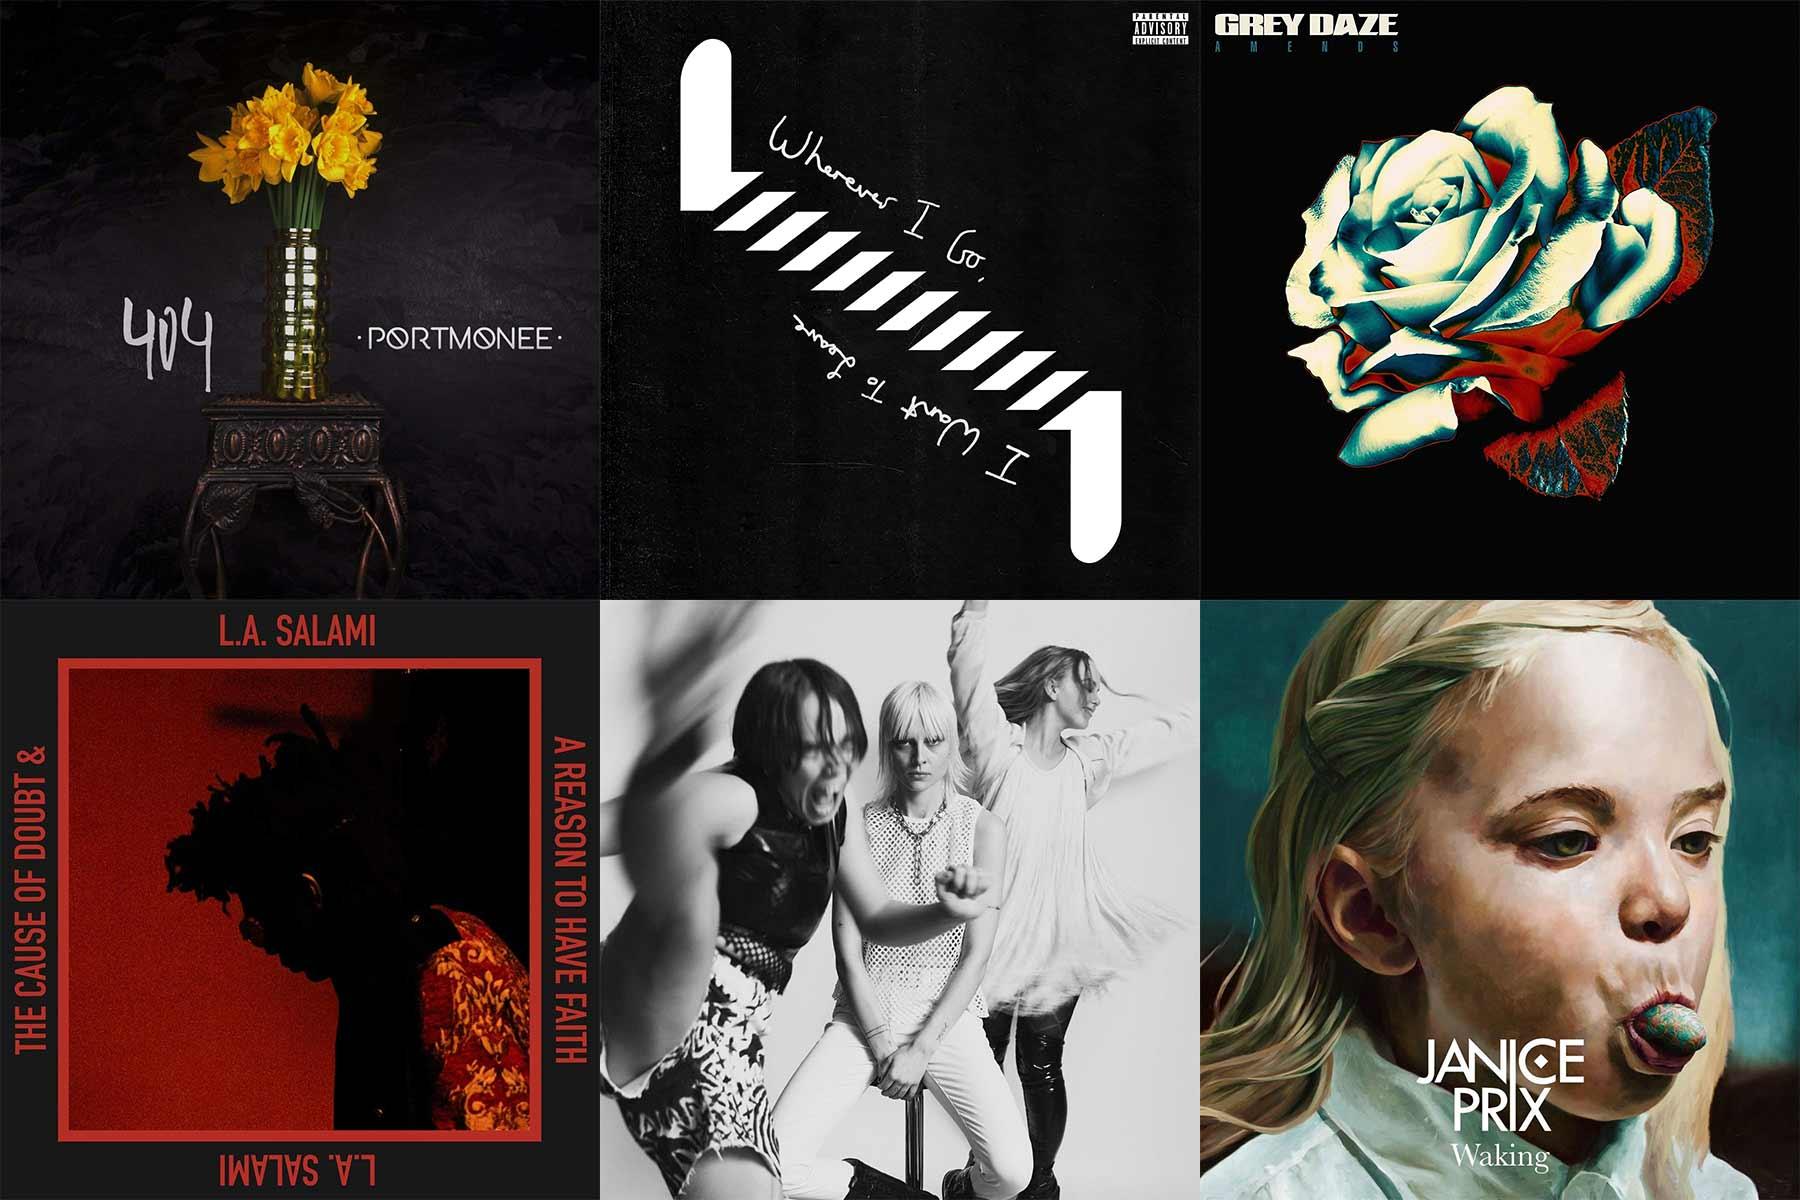 Kurzreviews: Neue Musikalben im Juli 2020 kurzreviews-juli-2020-1